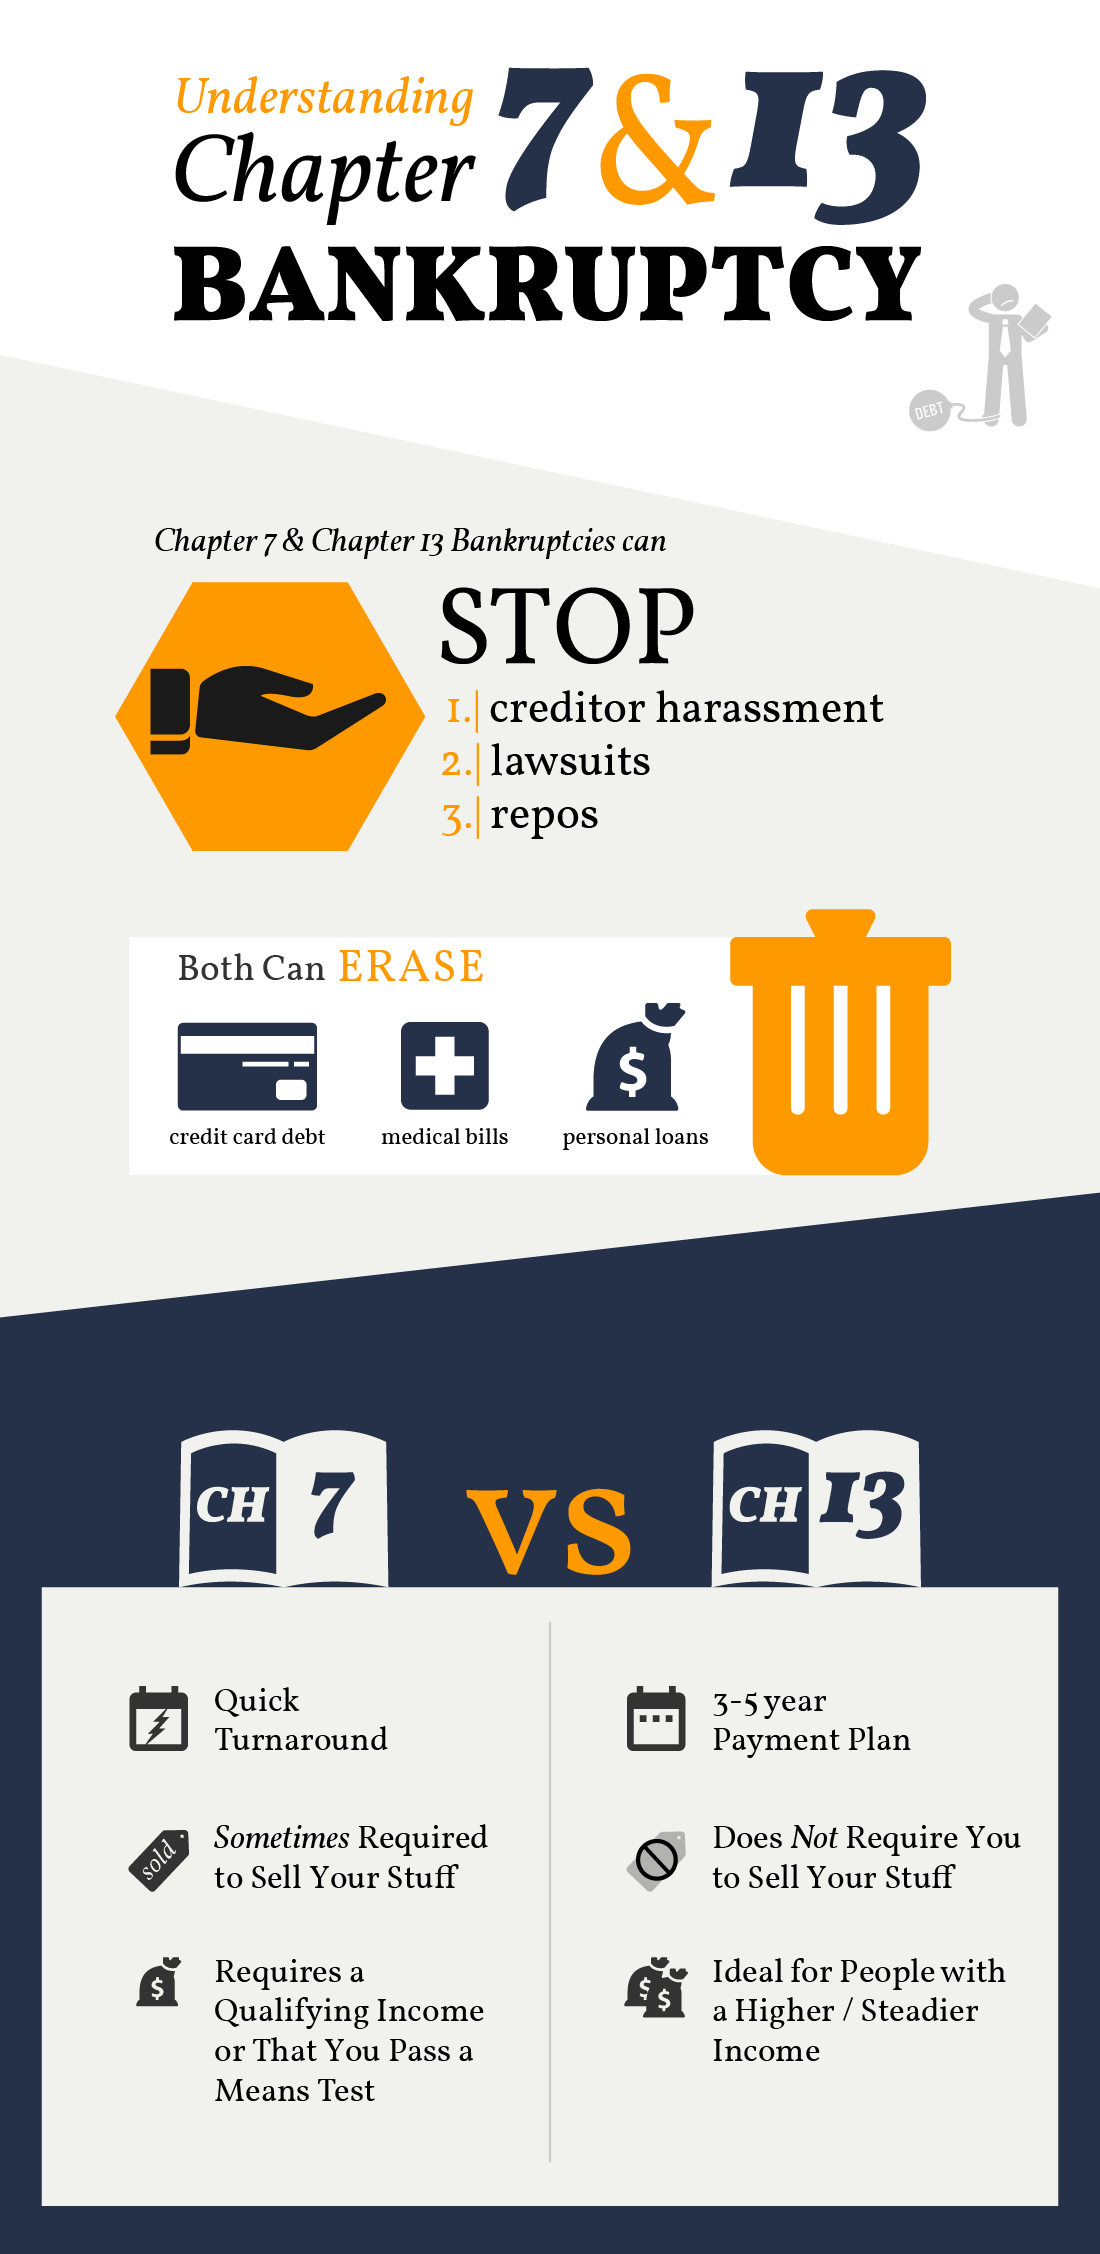 Chapter 7 & 13 Bankruptcy Comparison Chart